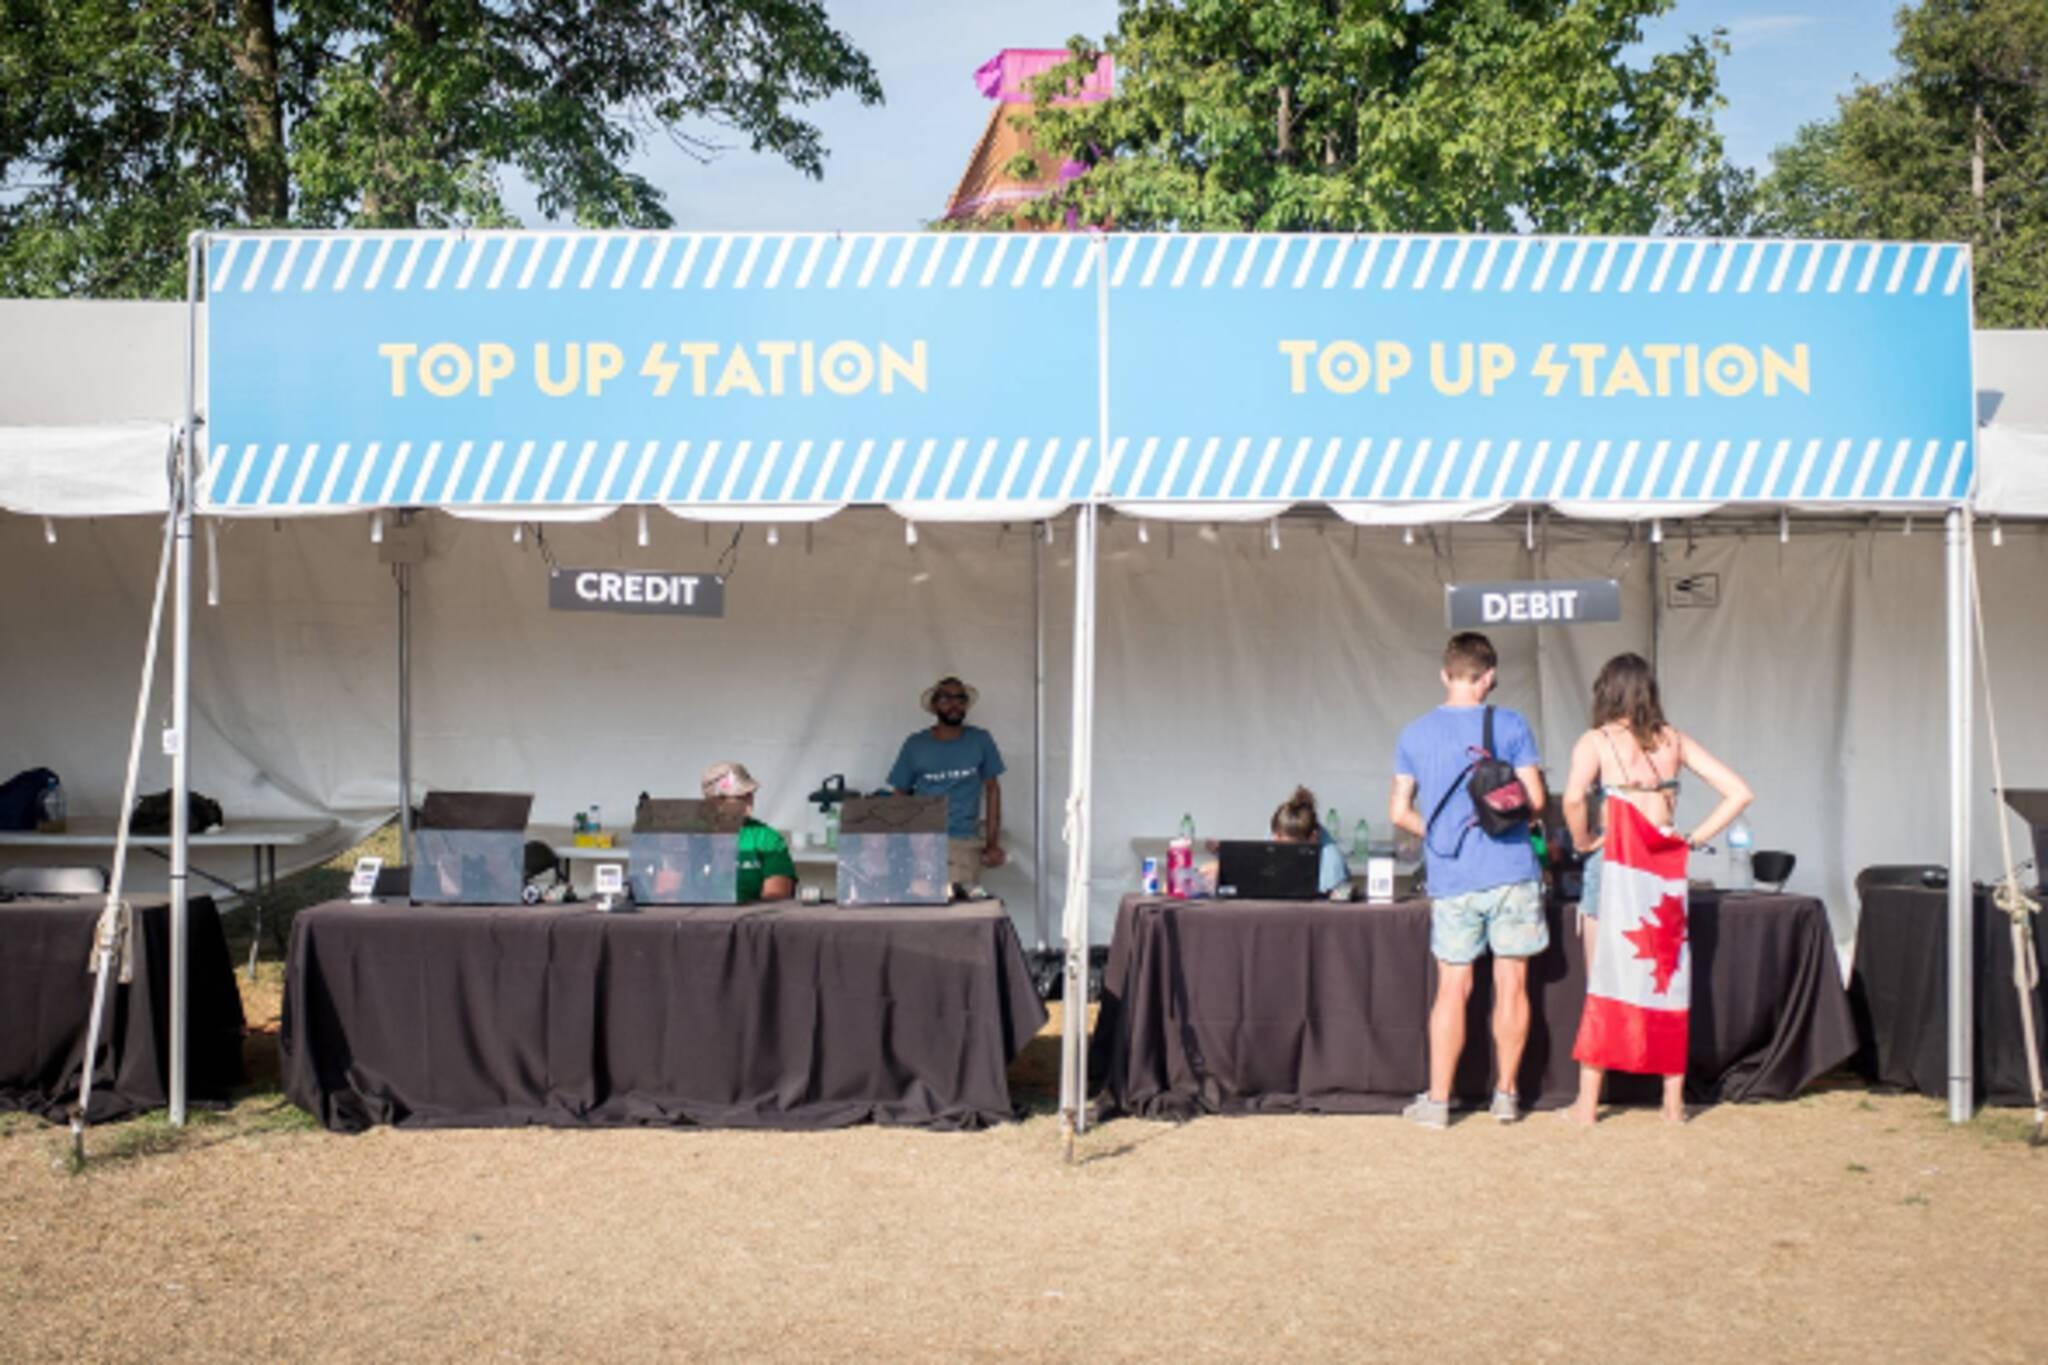 Toronto cashless music festivals